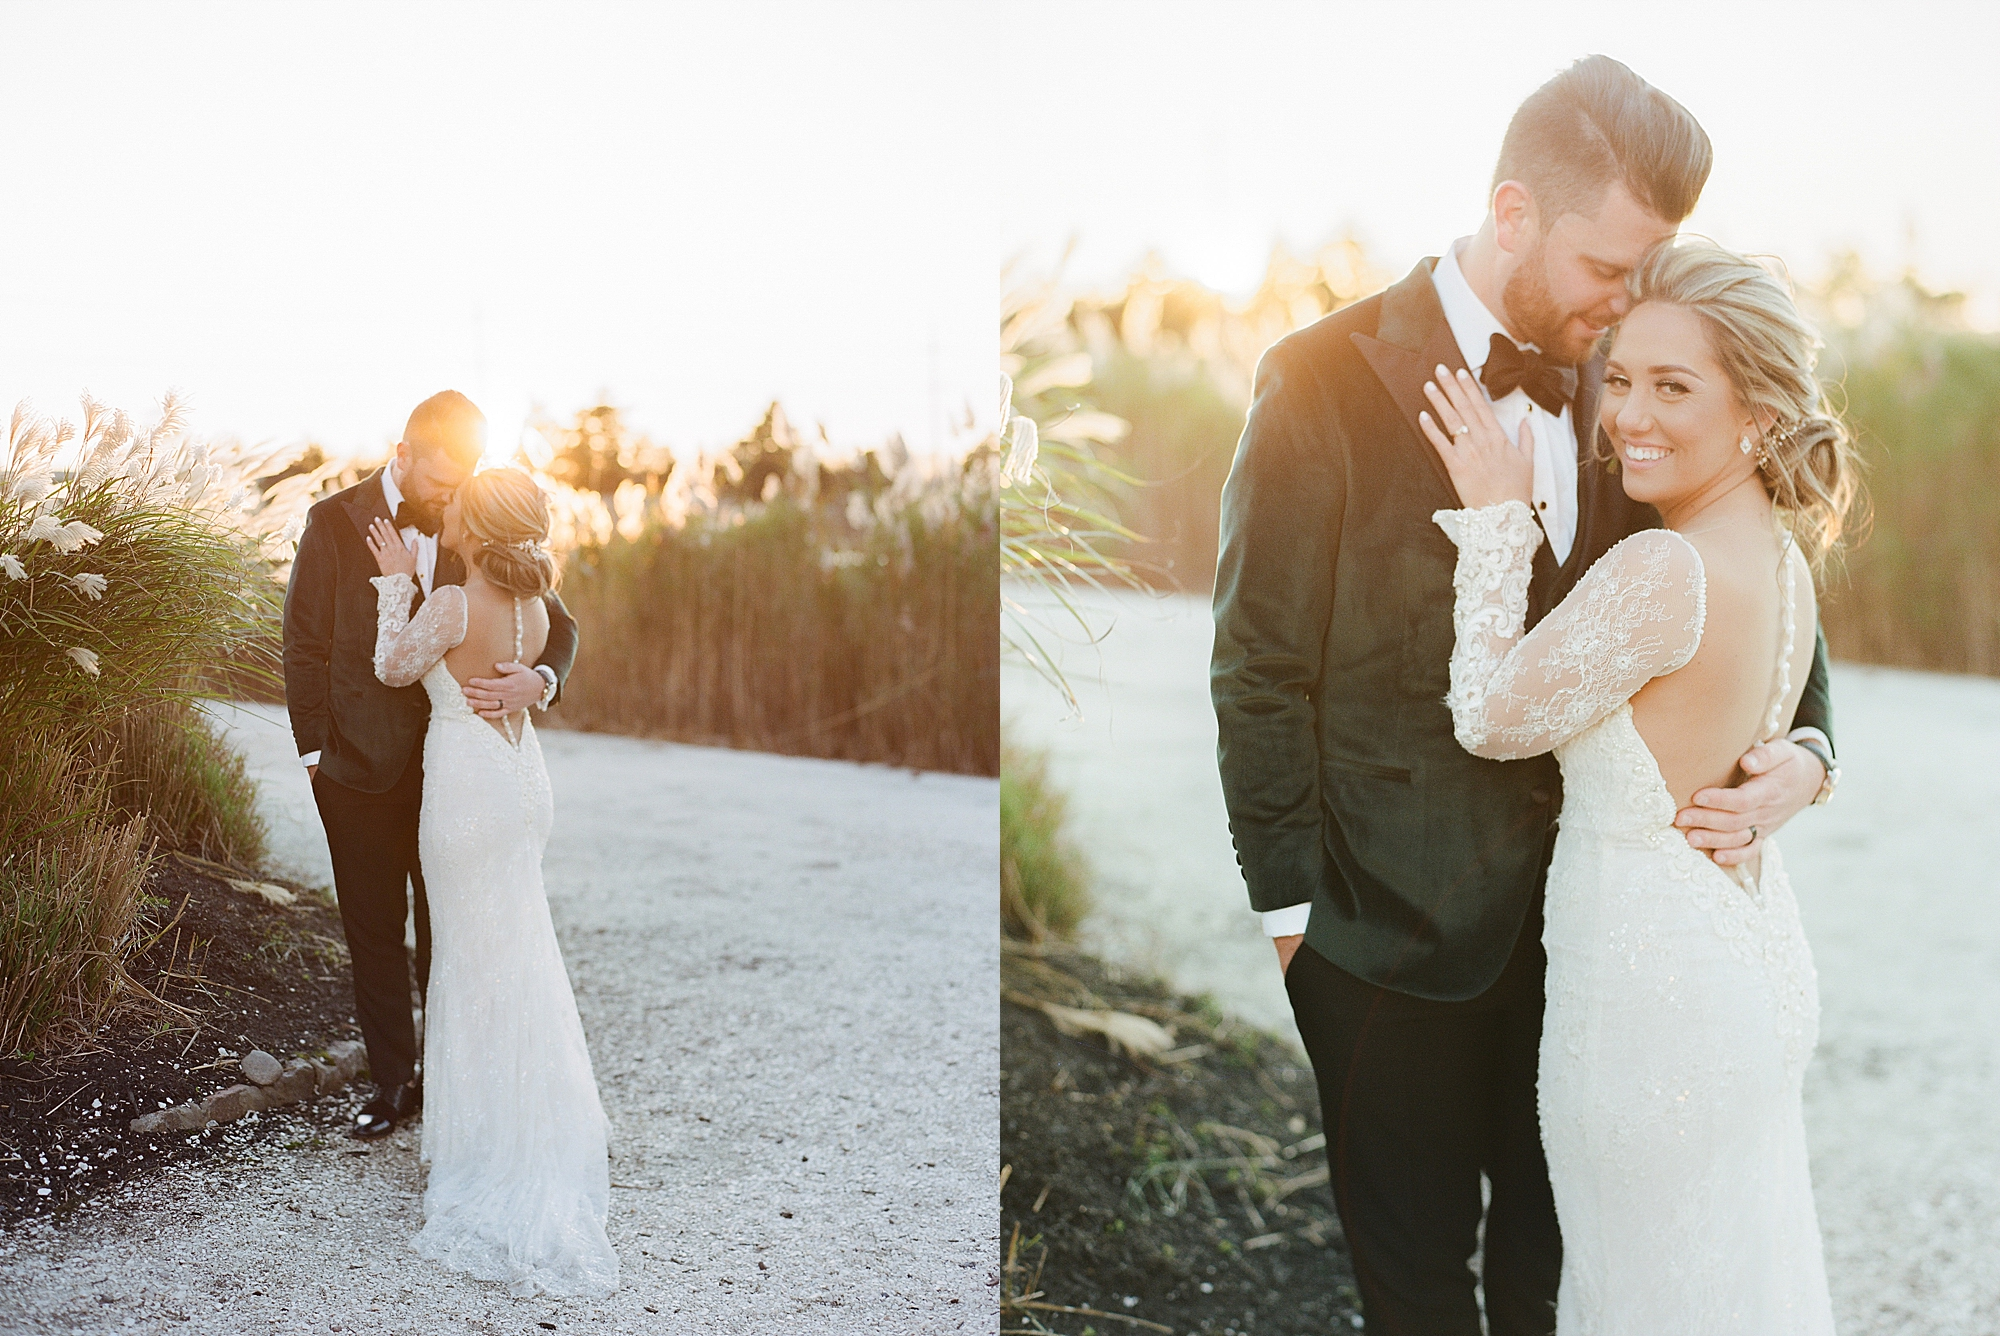 Bonnet Island Estate Film Wedding Photography by Magdalena Studios 0053